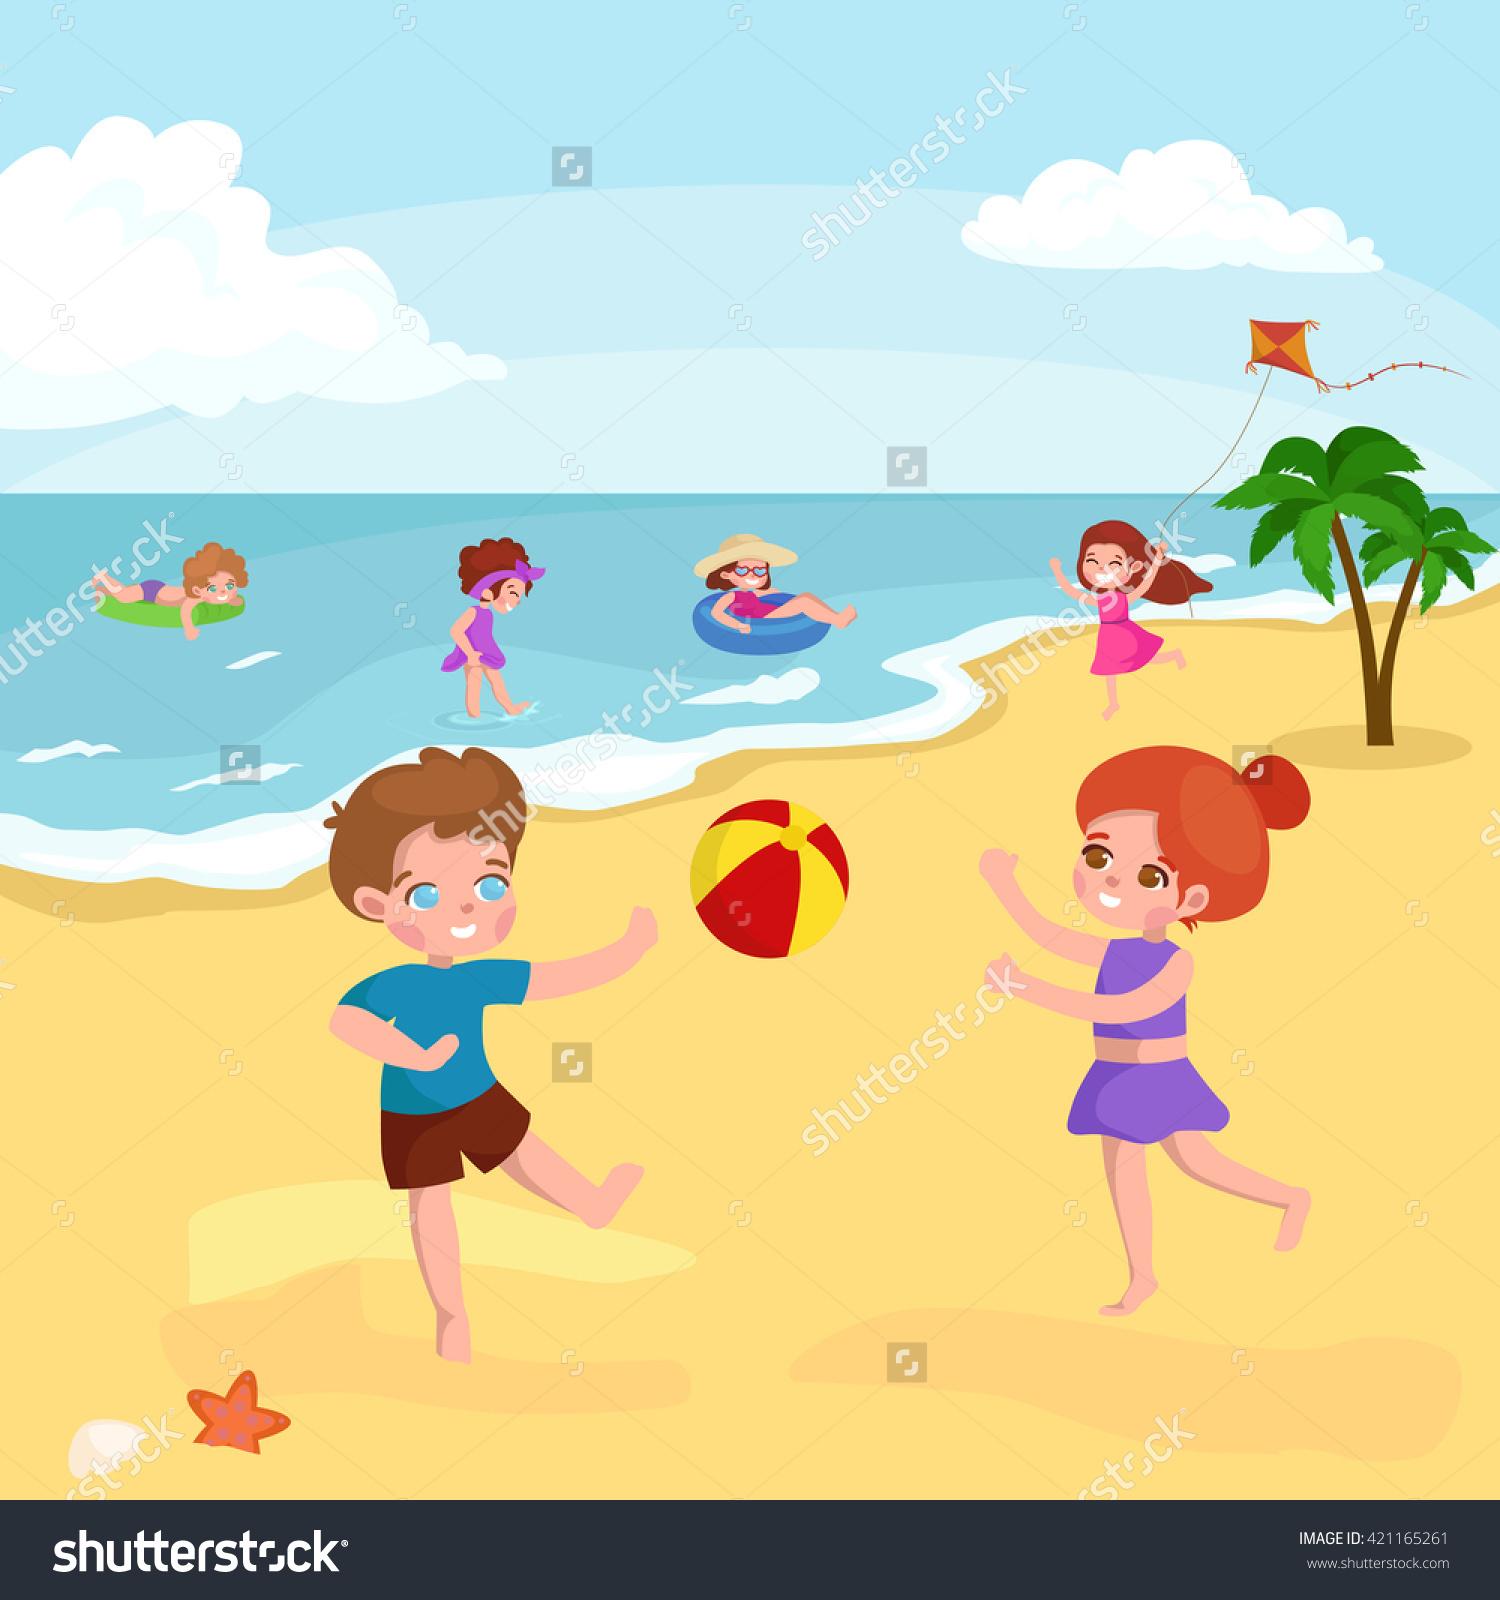 Children Summertime Vacation Parkkids Playing Sand Stock Vector.